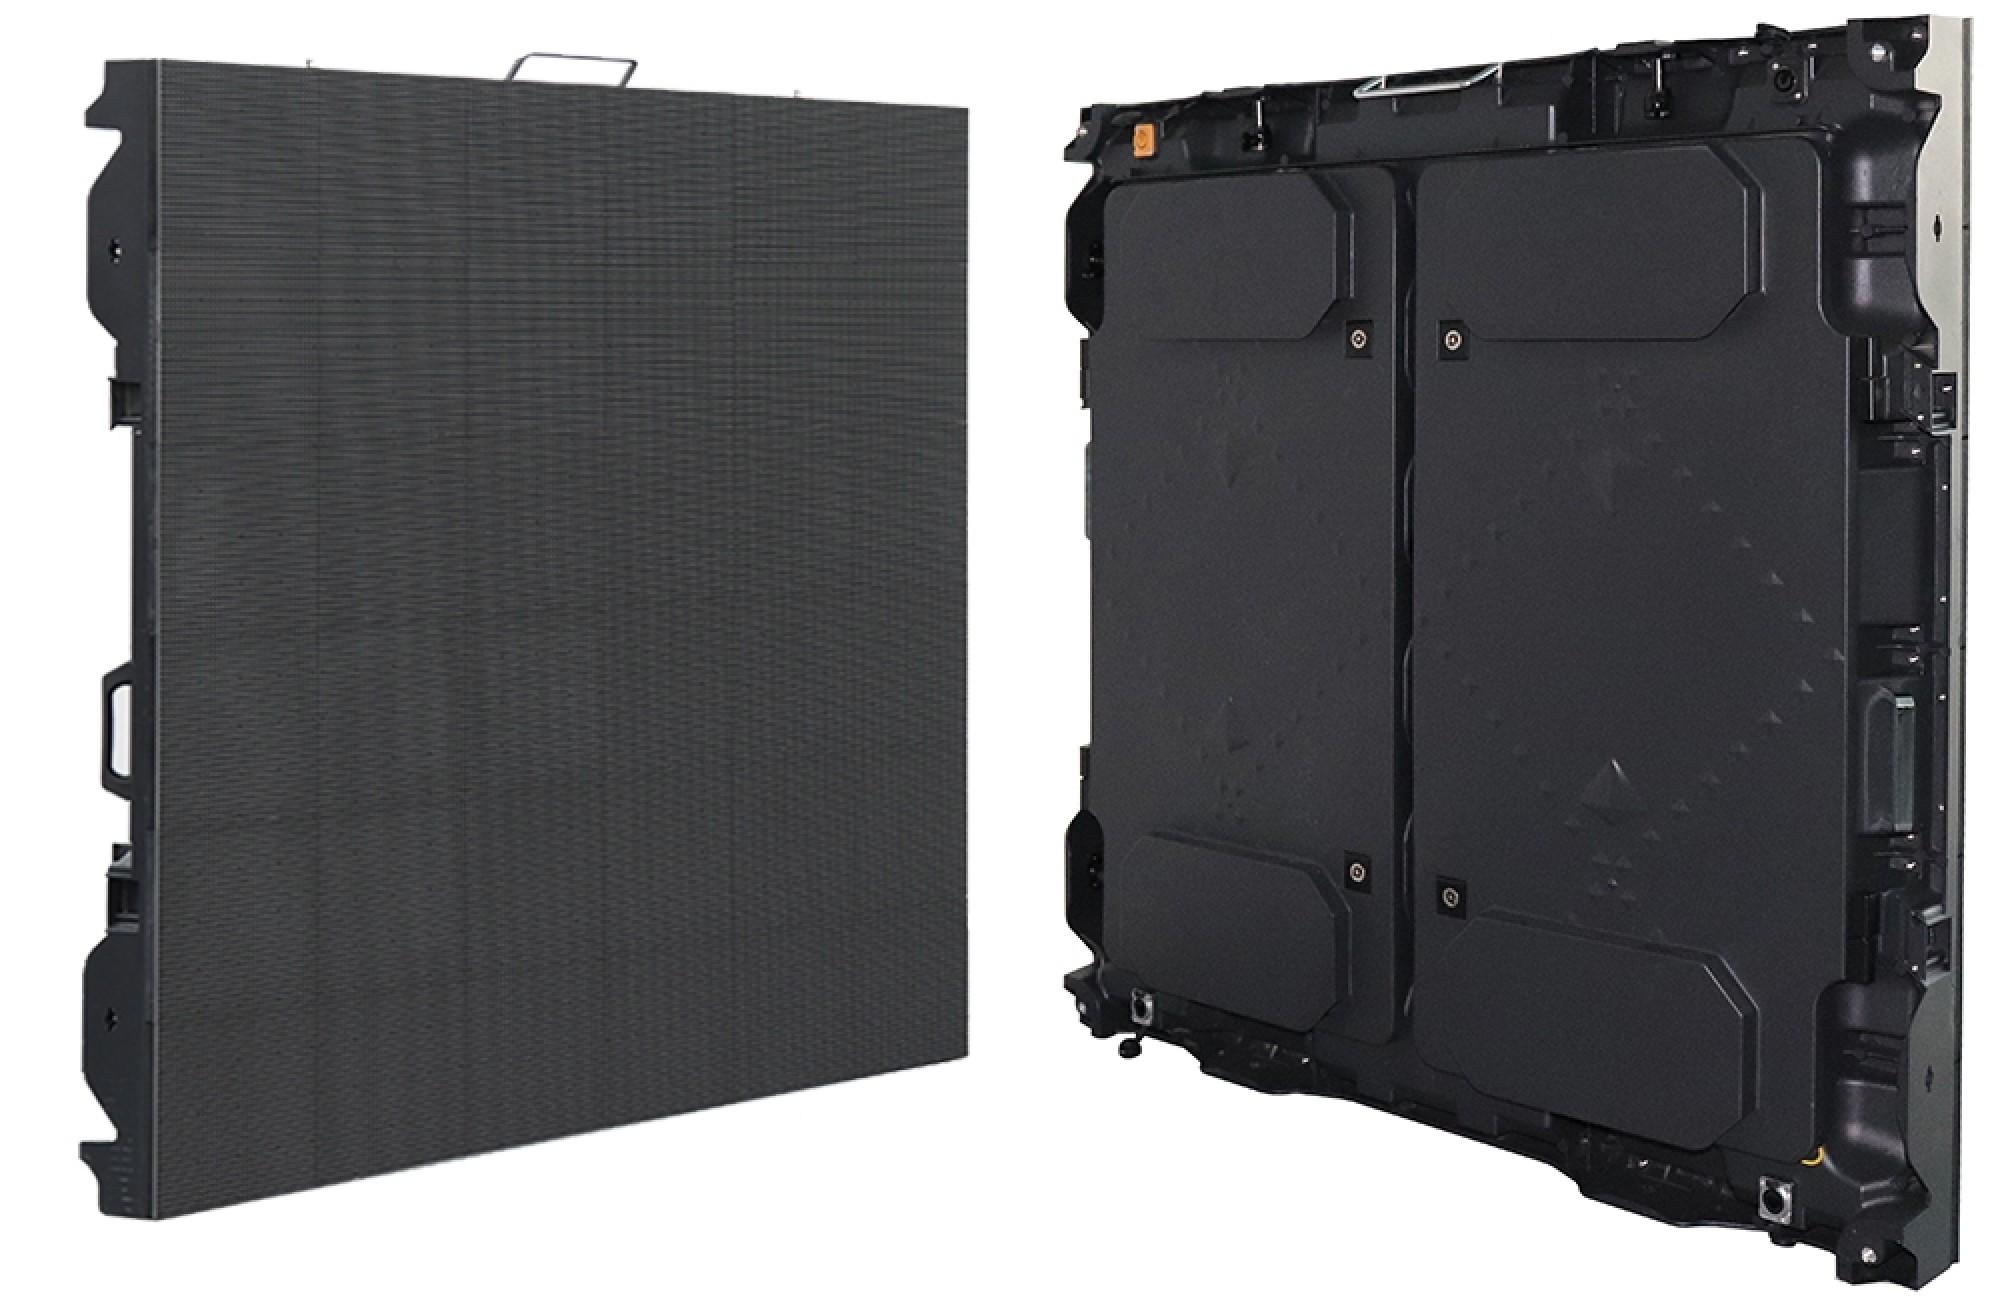 P10 Stadium Perimeter   Renting   Fix Installation LED Screen Board